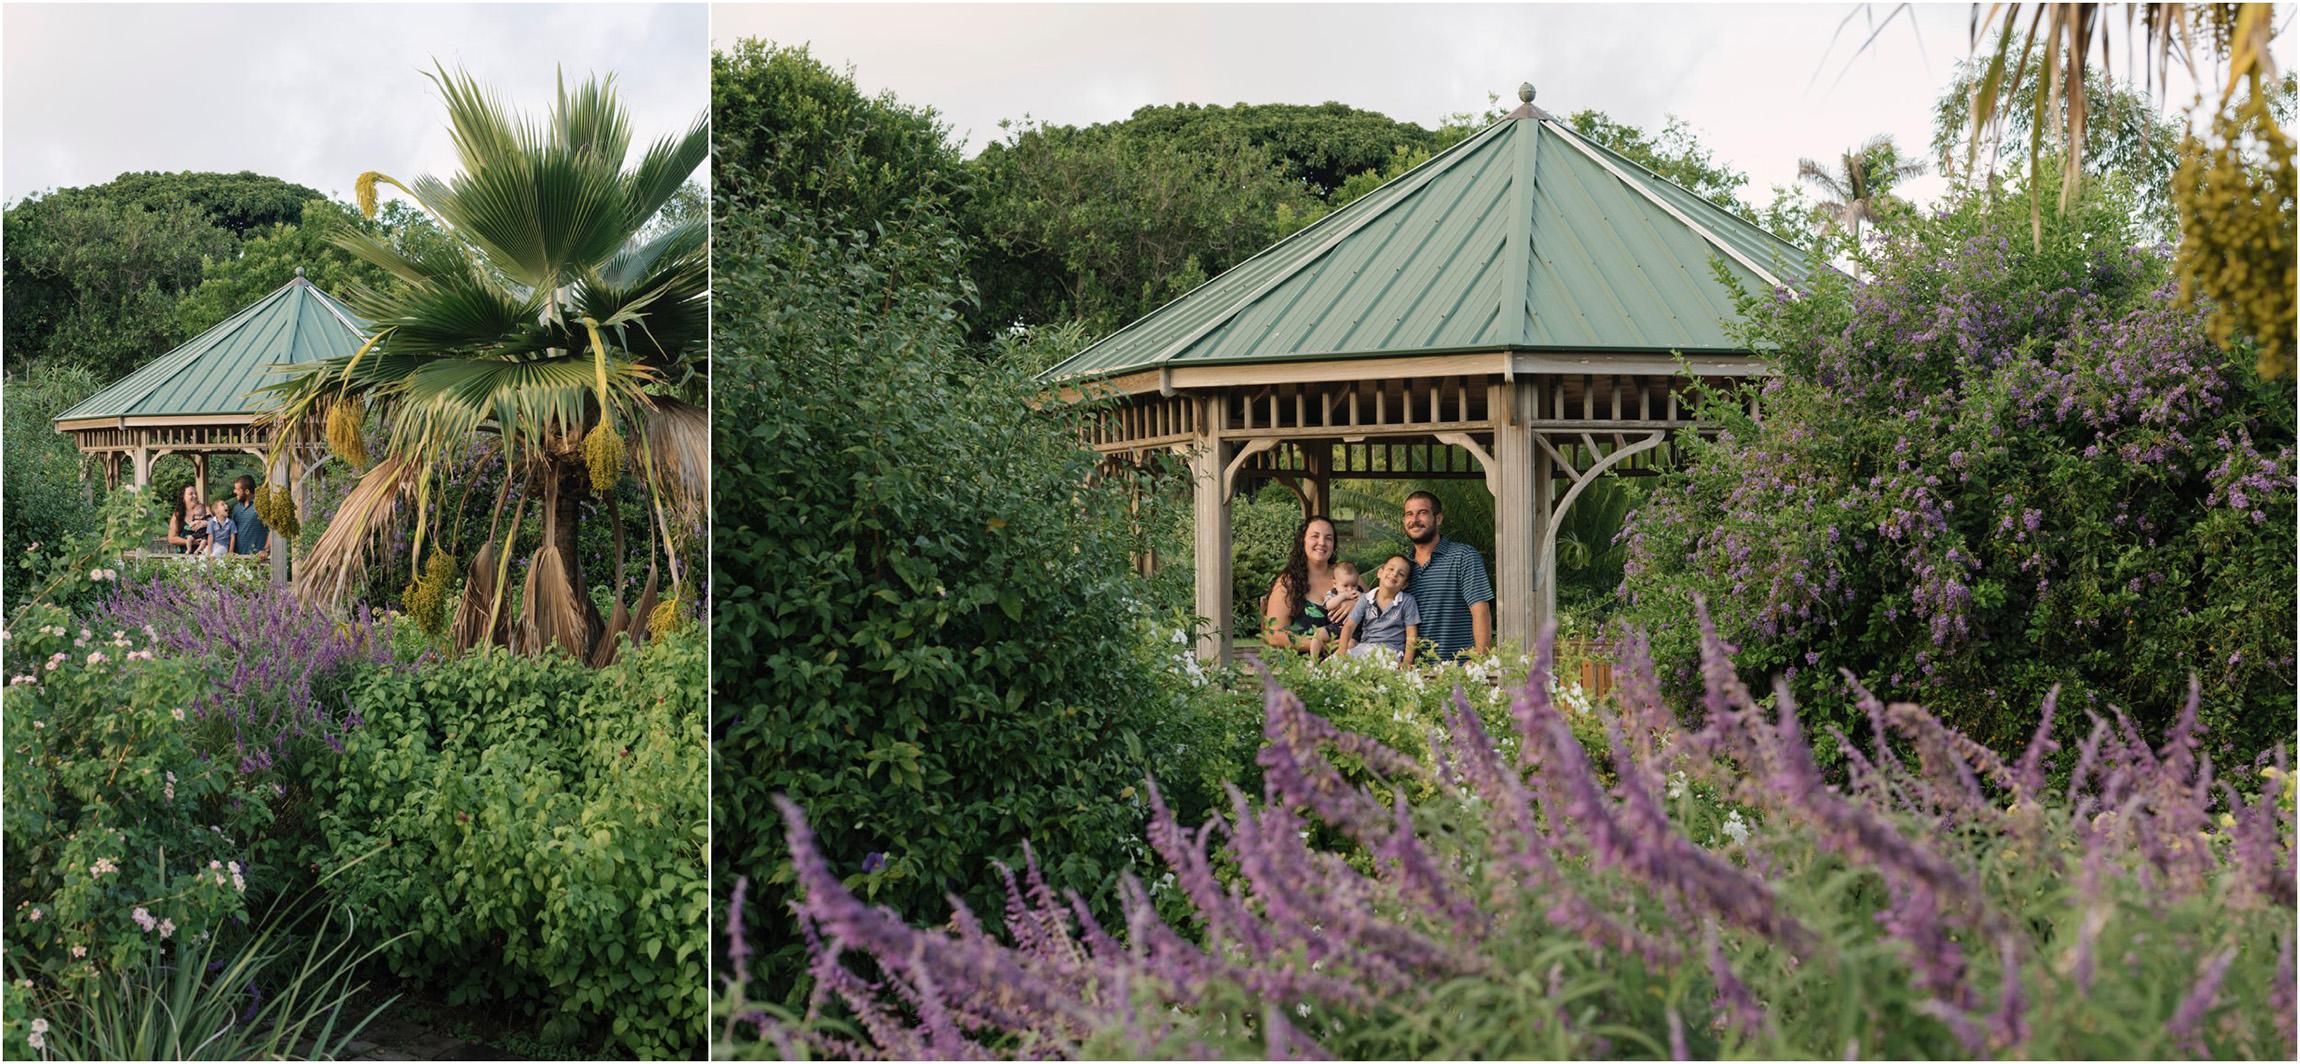 ©FianderFoto_Bermuda Family Photogarpher_Botanical Gardens_Amaro_006.jpg